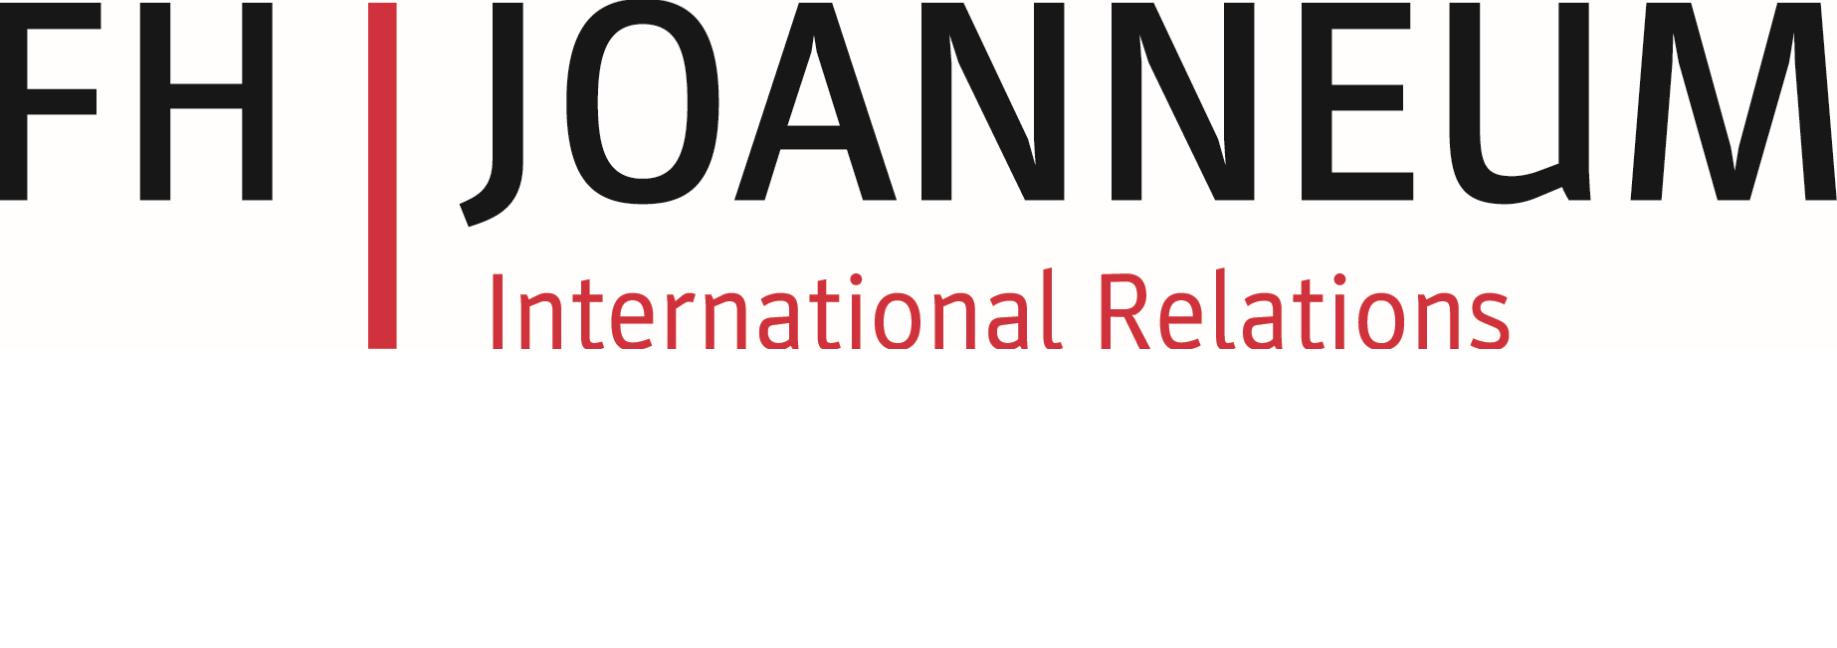 FH Joanneum International Relations Logo